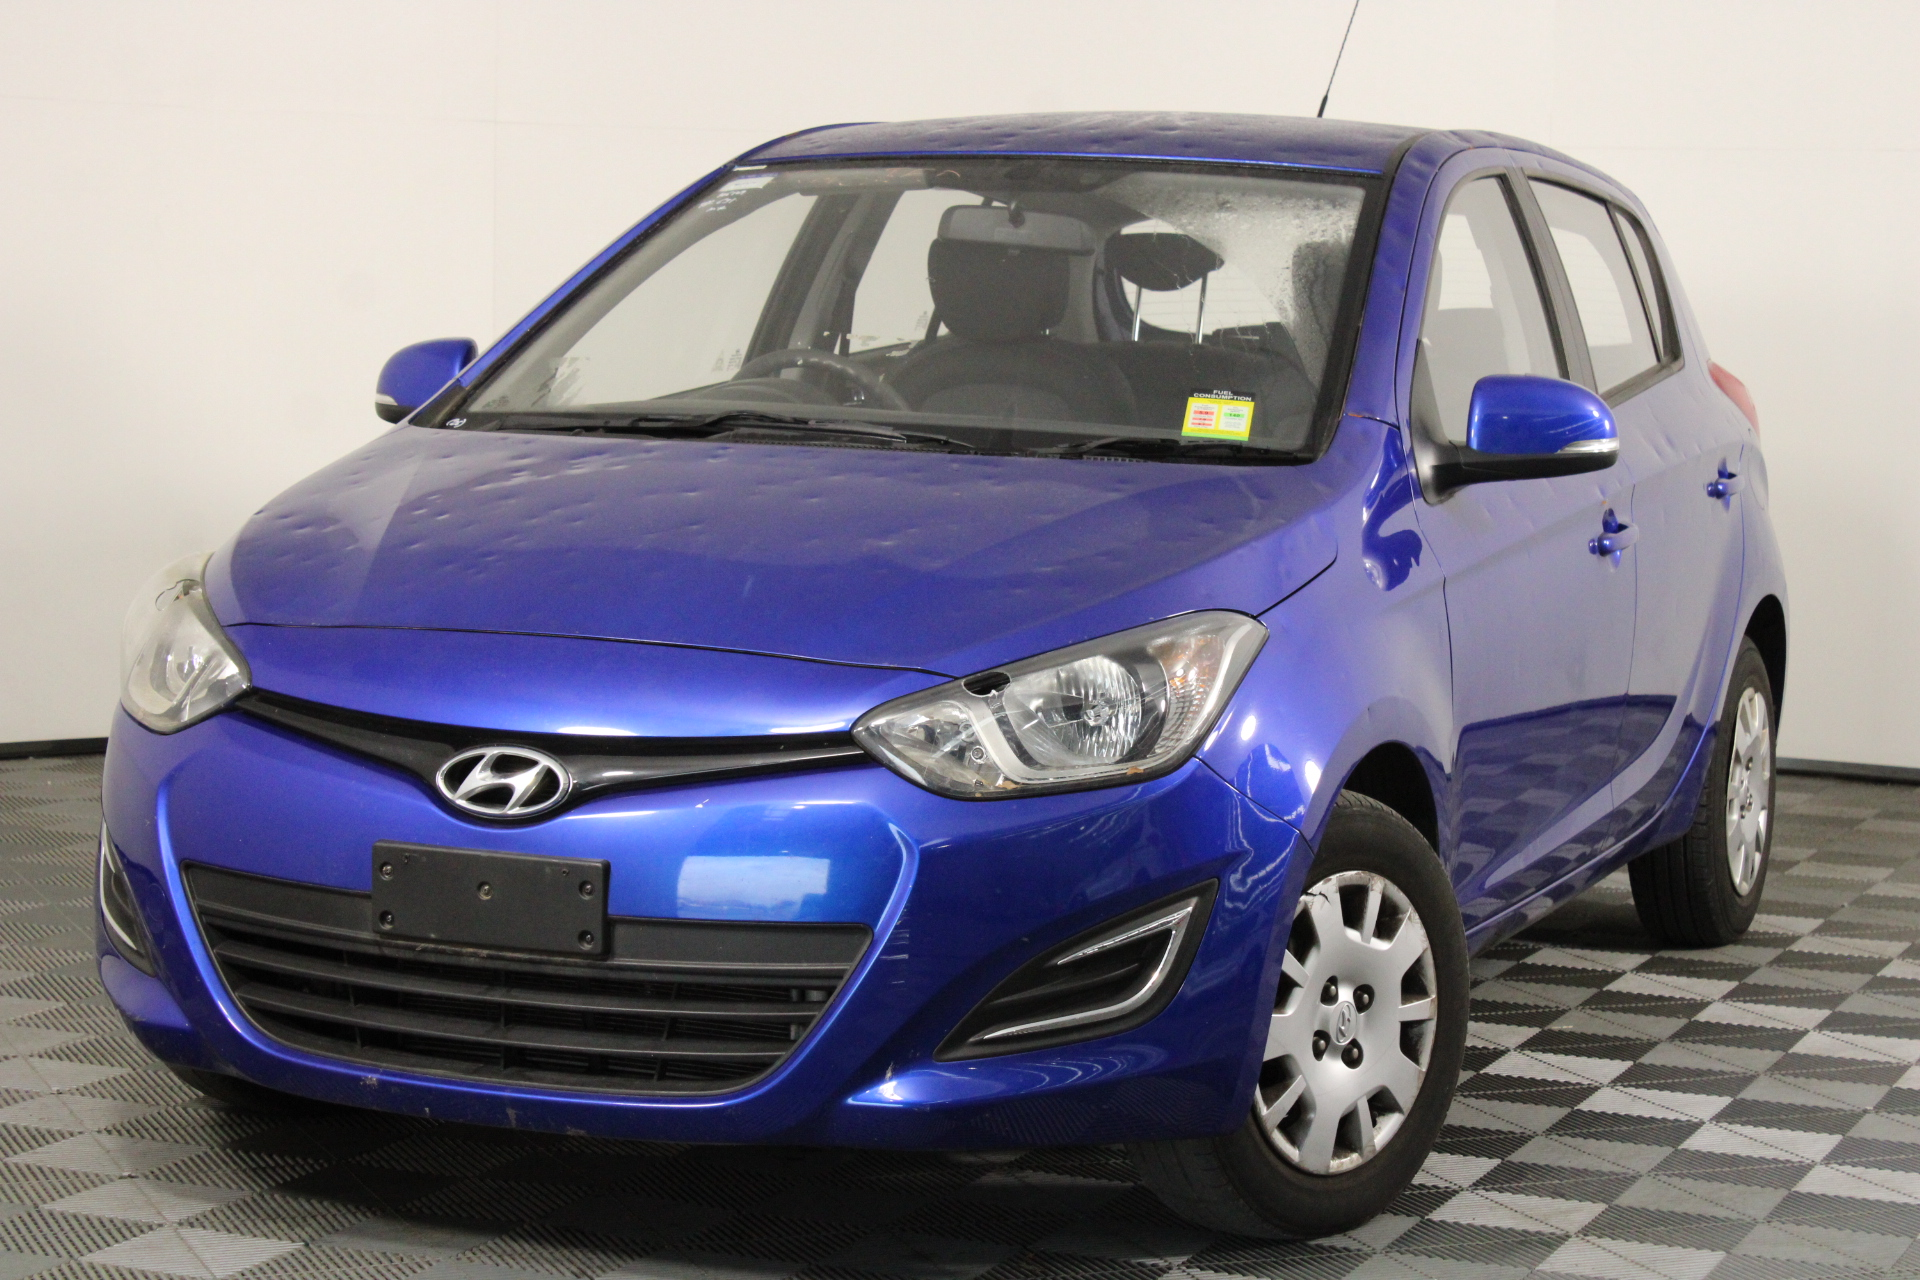 2014 Hyundai i20 Active PB Automatic Hatchback (WOVR Inspected)